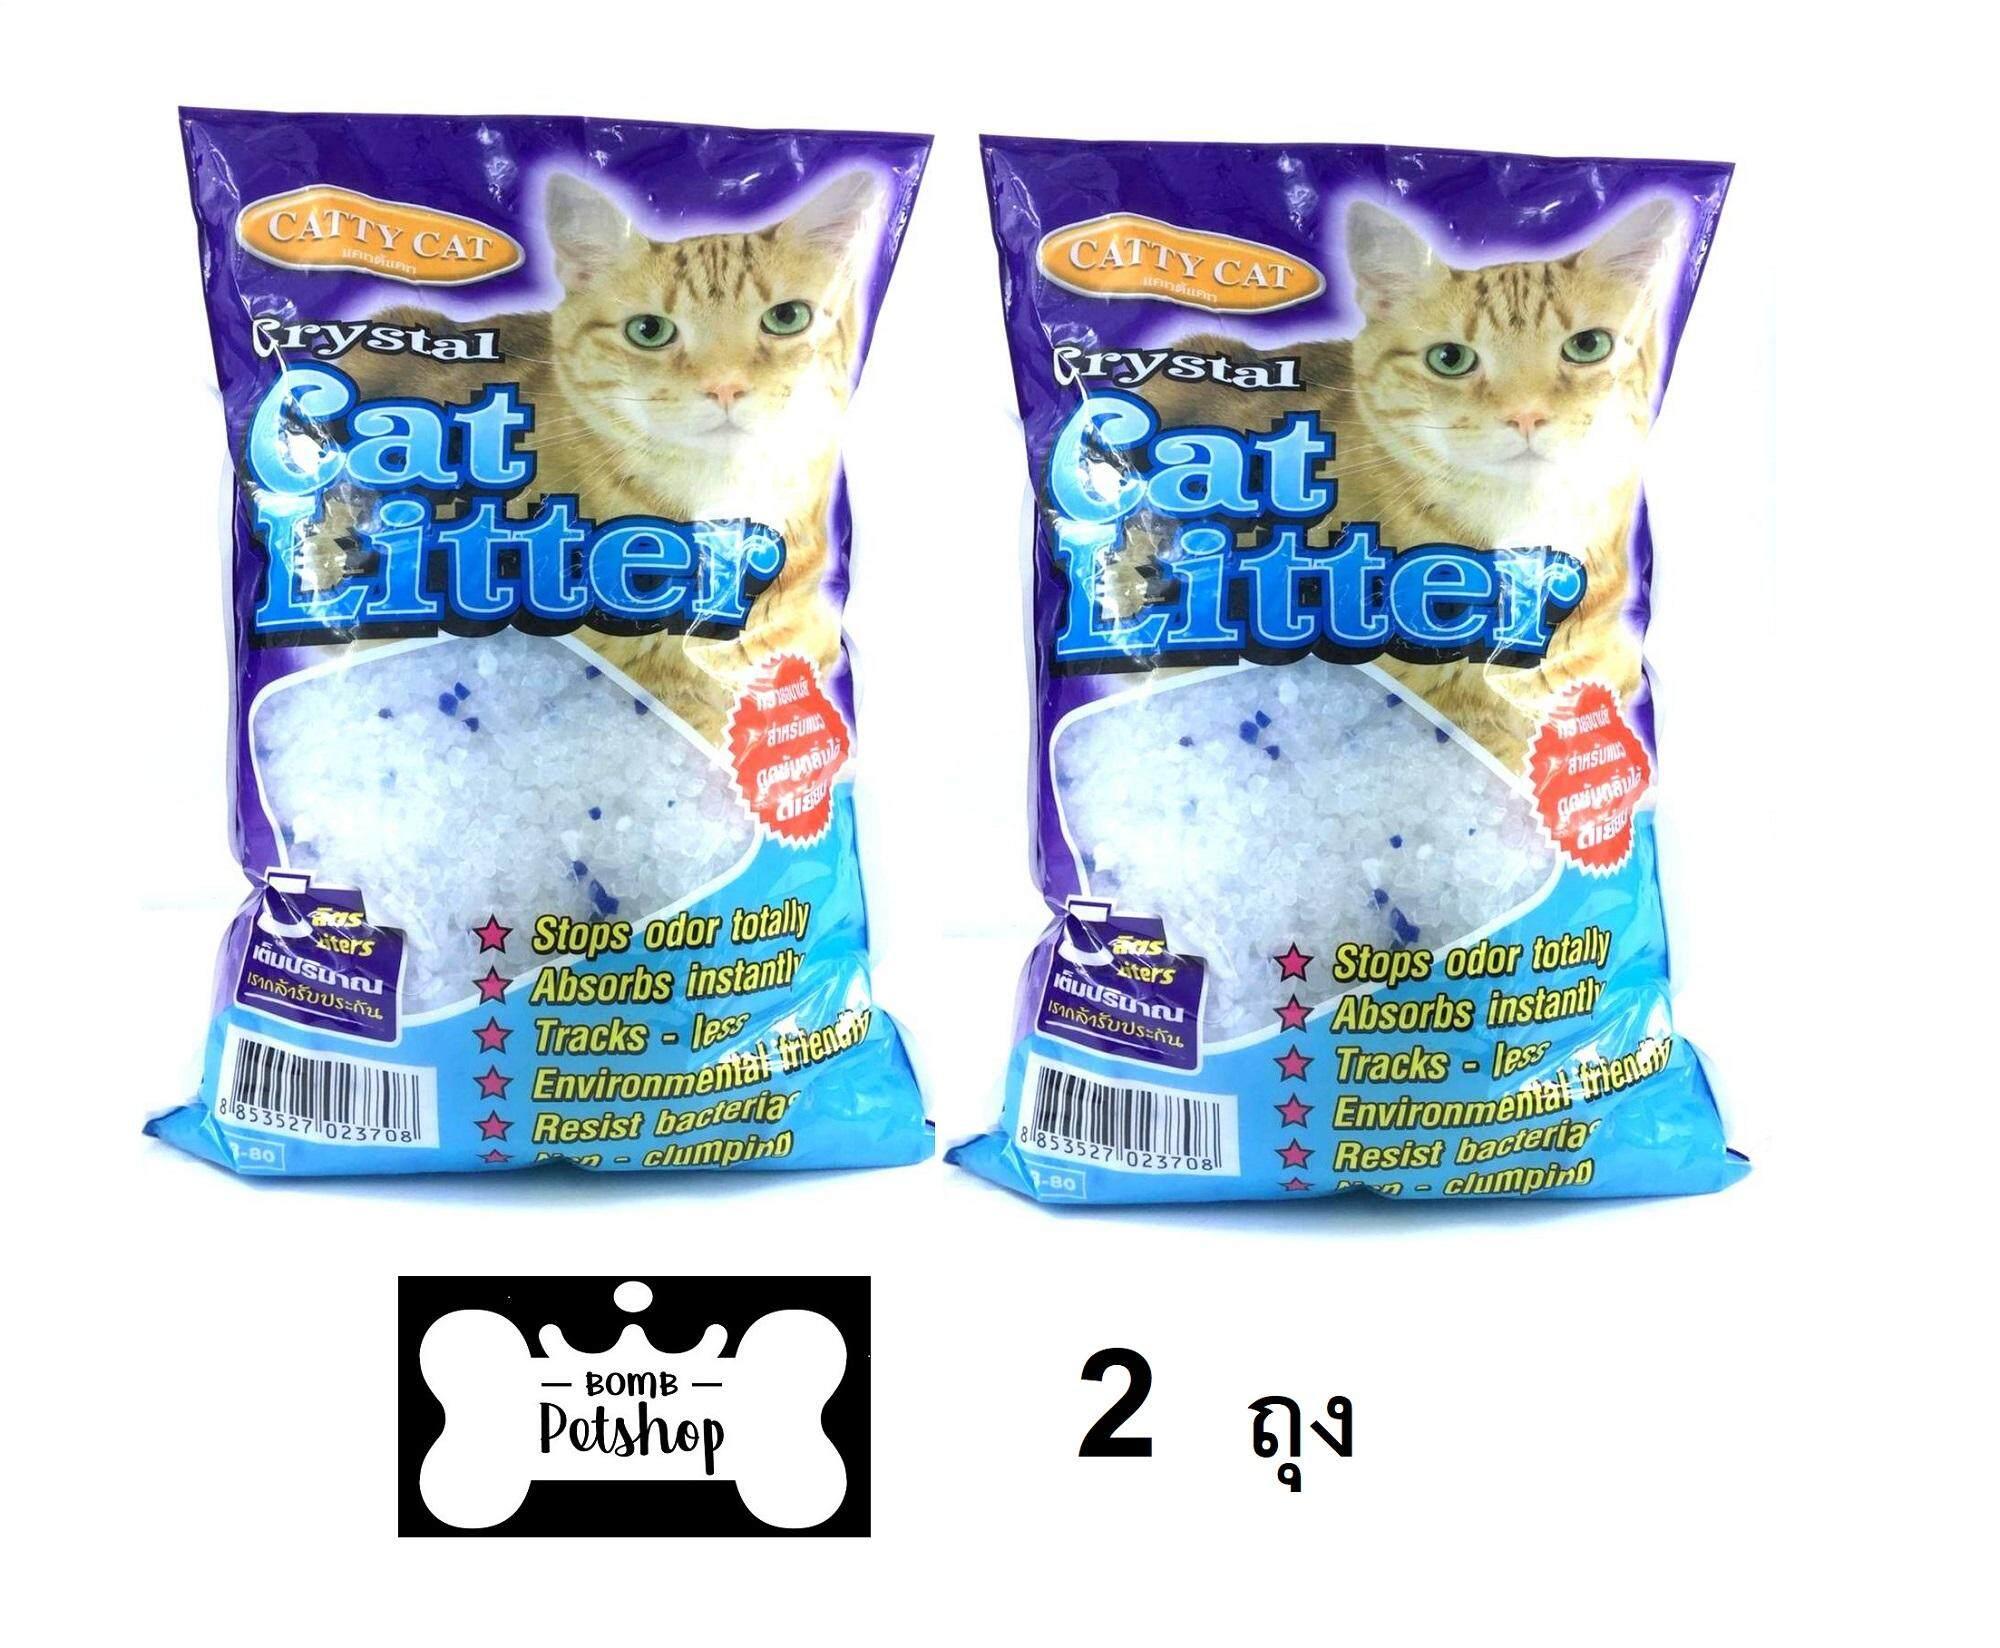 Cattycat Crystal Cat Litter ทรายอนามัยชนิดคริสตัลผสมเม็ดบีทสีฟ้า  5L ( 2 units )